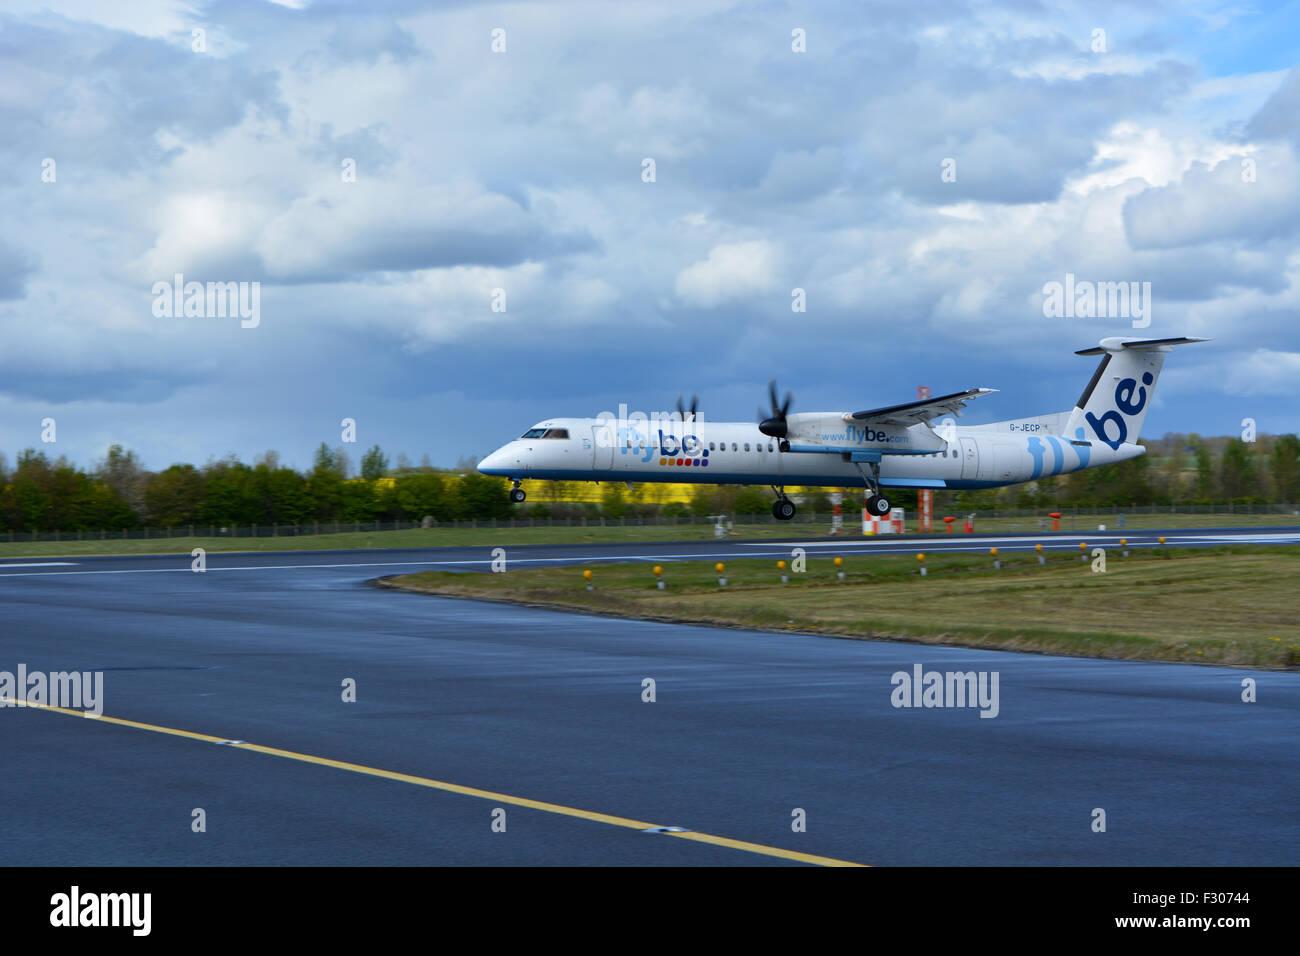 A Flybe Dash 8 Q400 landing on runway 24 at Edinburgh during Summer 2015 arriving from Belfast, UK. - Stock Image